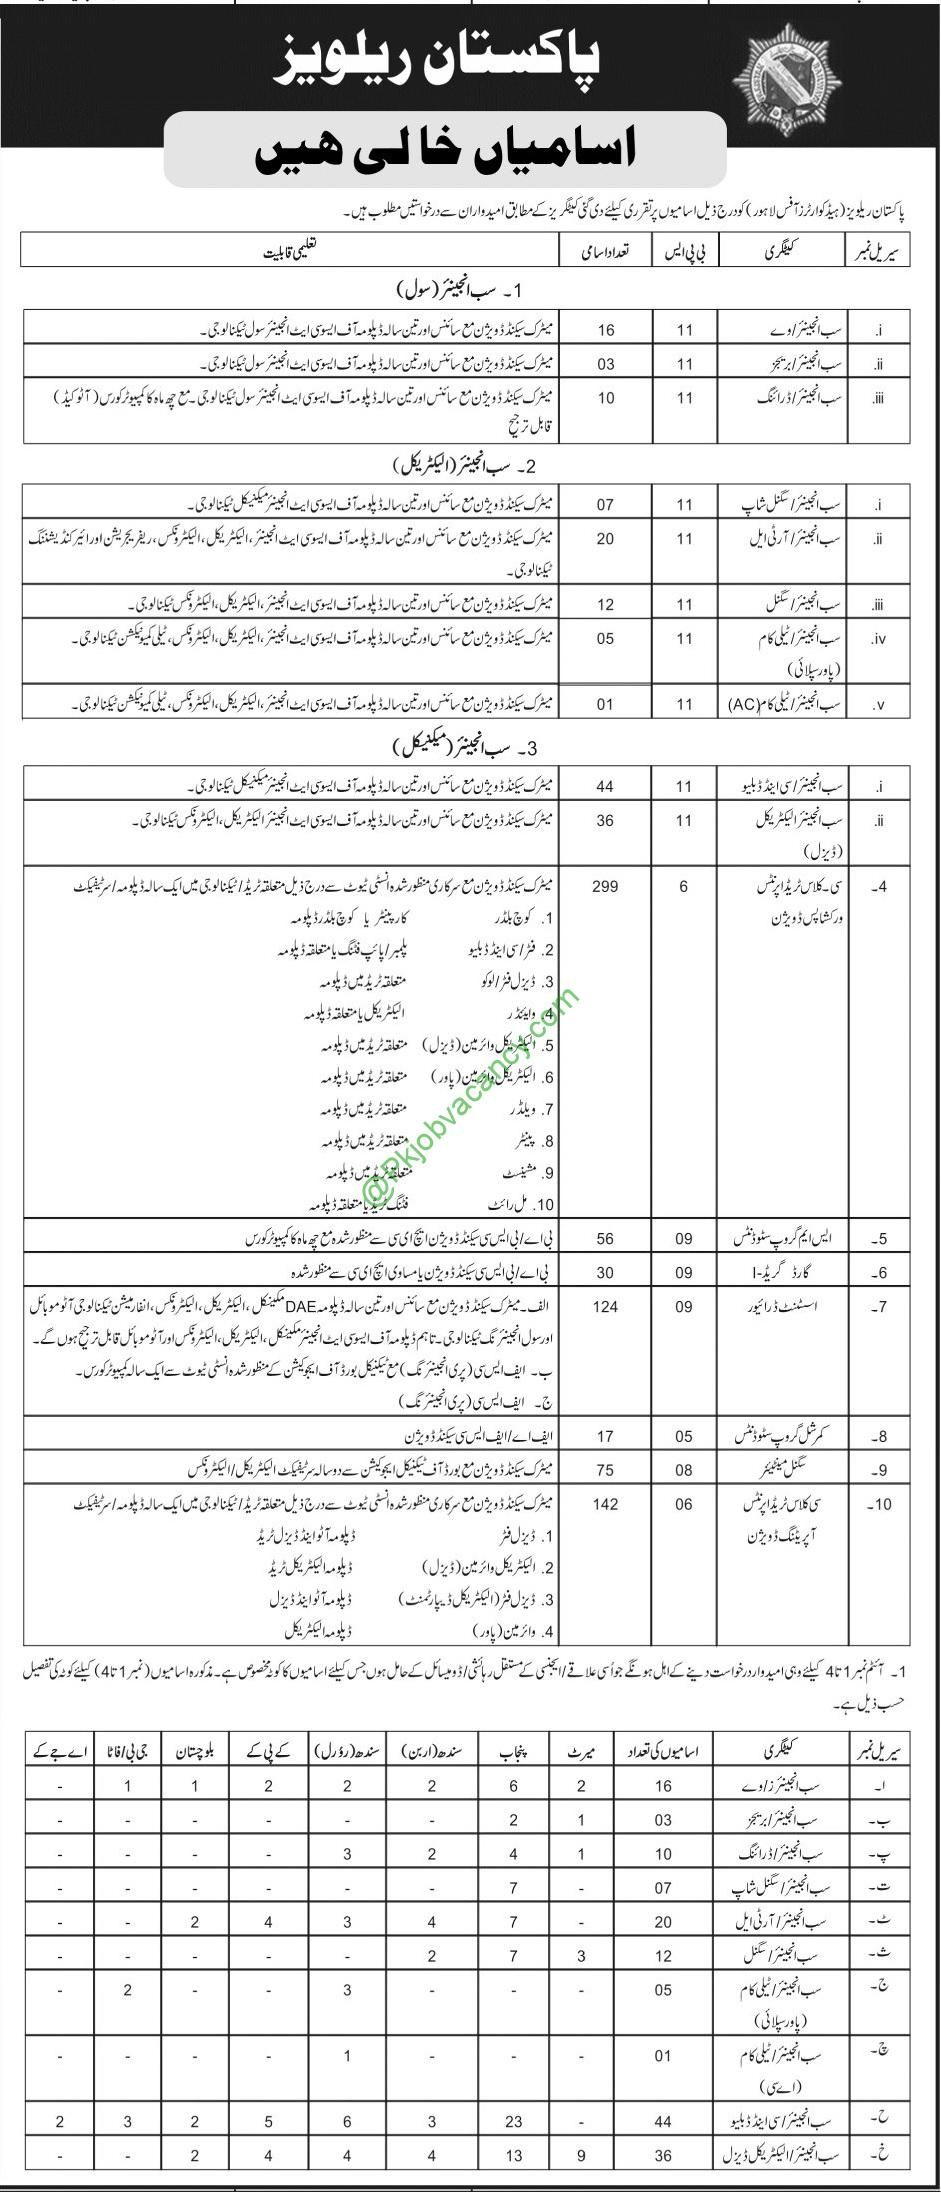 Pakistan railways jobs pak rail latest pts 2017 jobs application pakistan railways jobs pak rail latest pts 2017 jobs application form download falaconquin